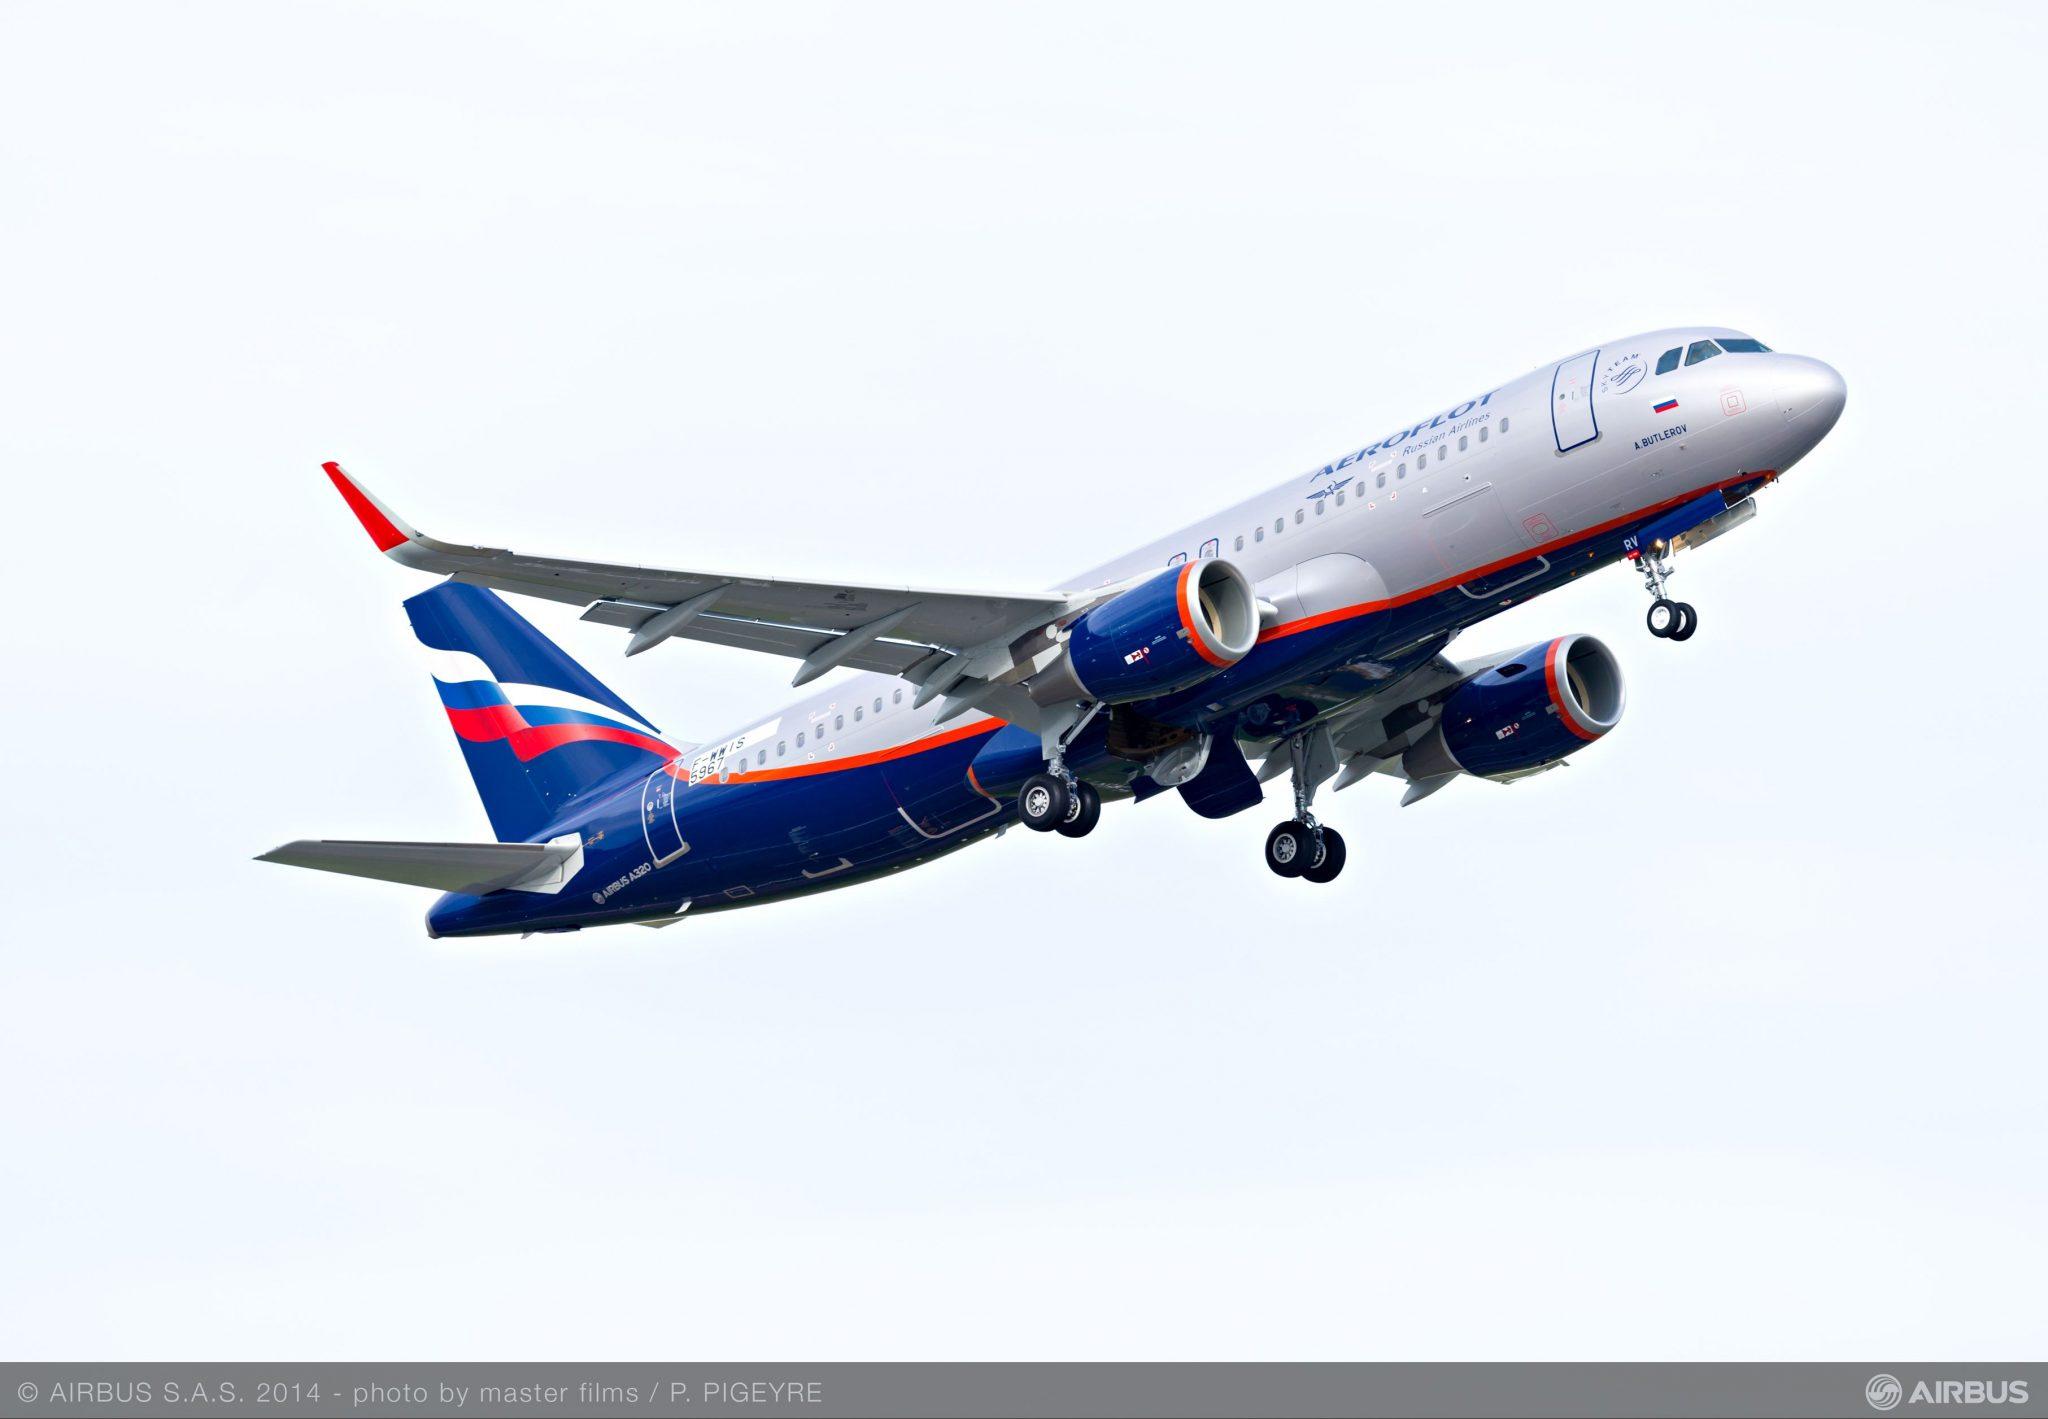 Aeroflot quiere incorporar a su flota nueve A320 neo